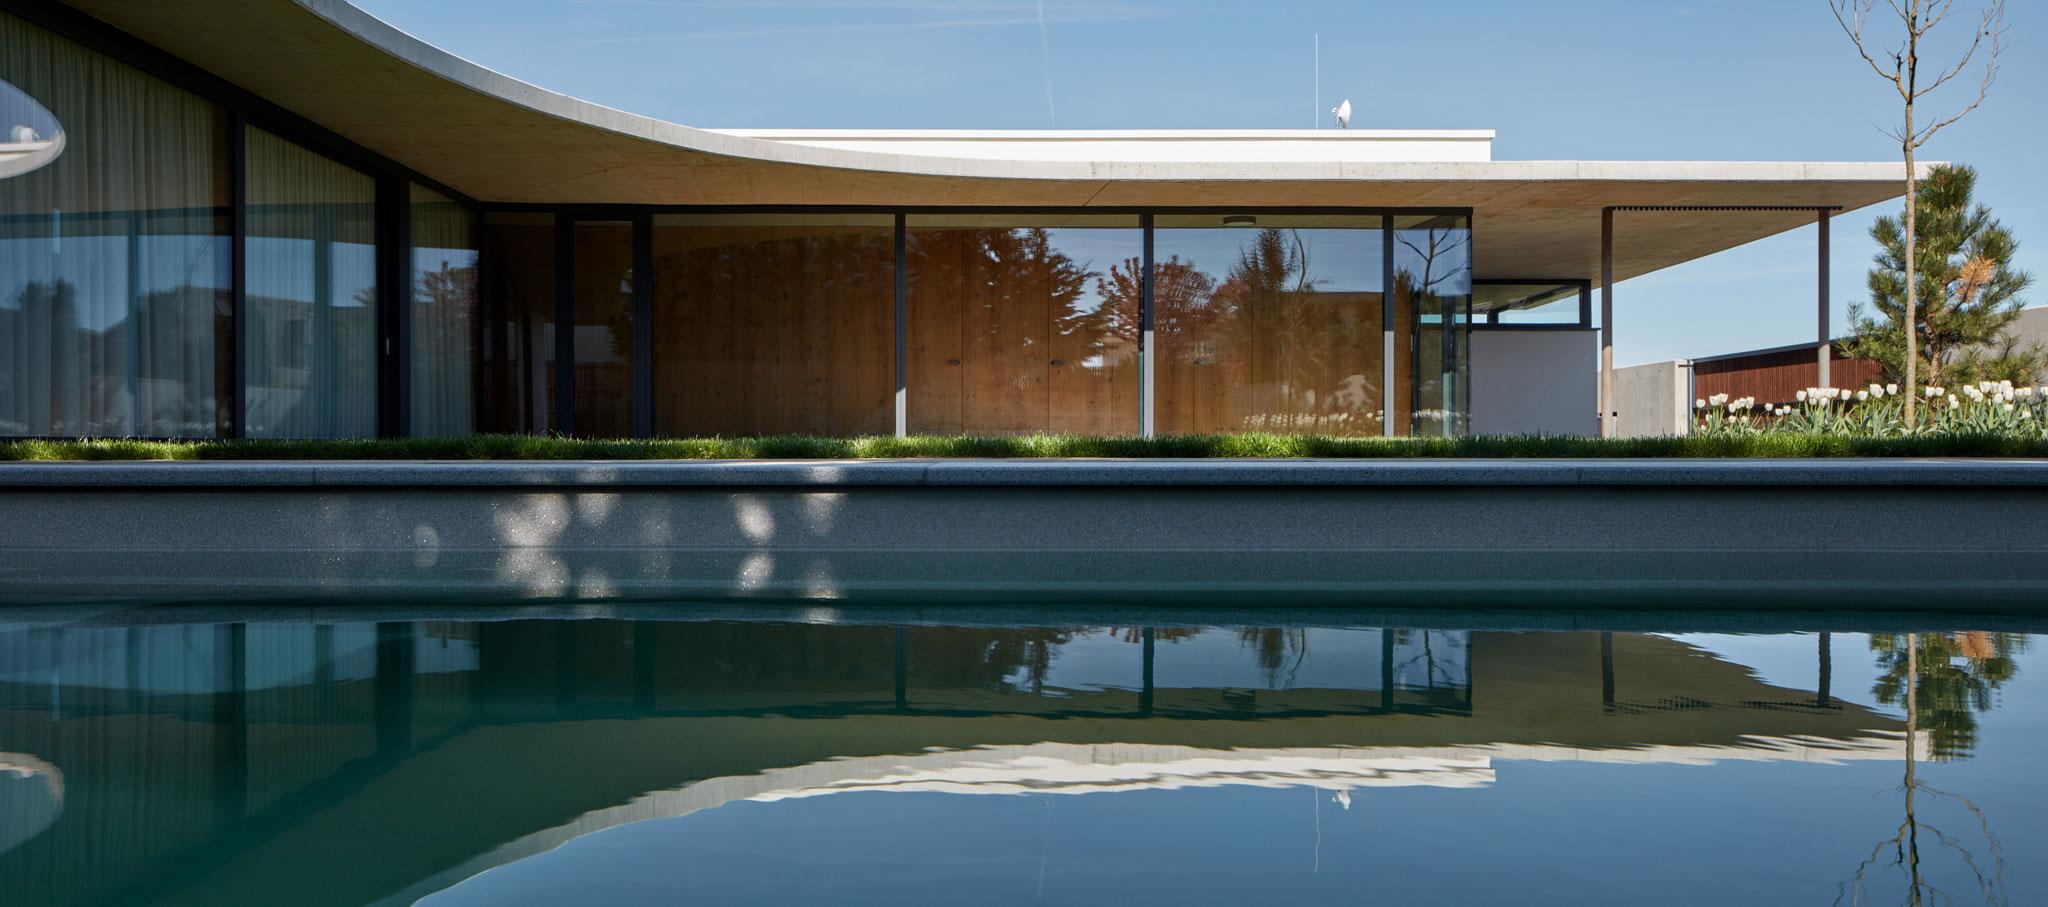 Family House Jarovce by Compass Architekti. Photograph by ®BoysPlayNice